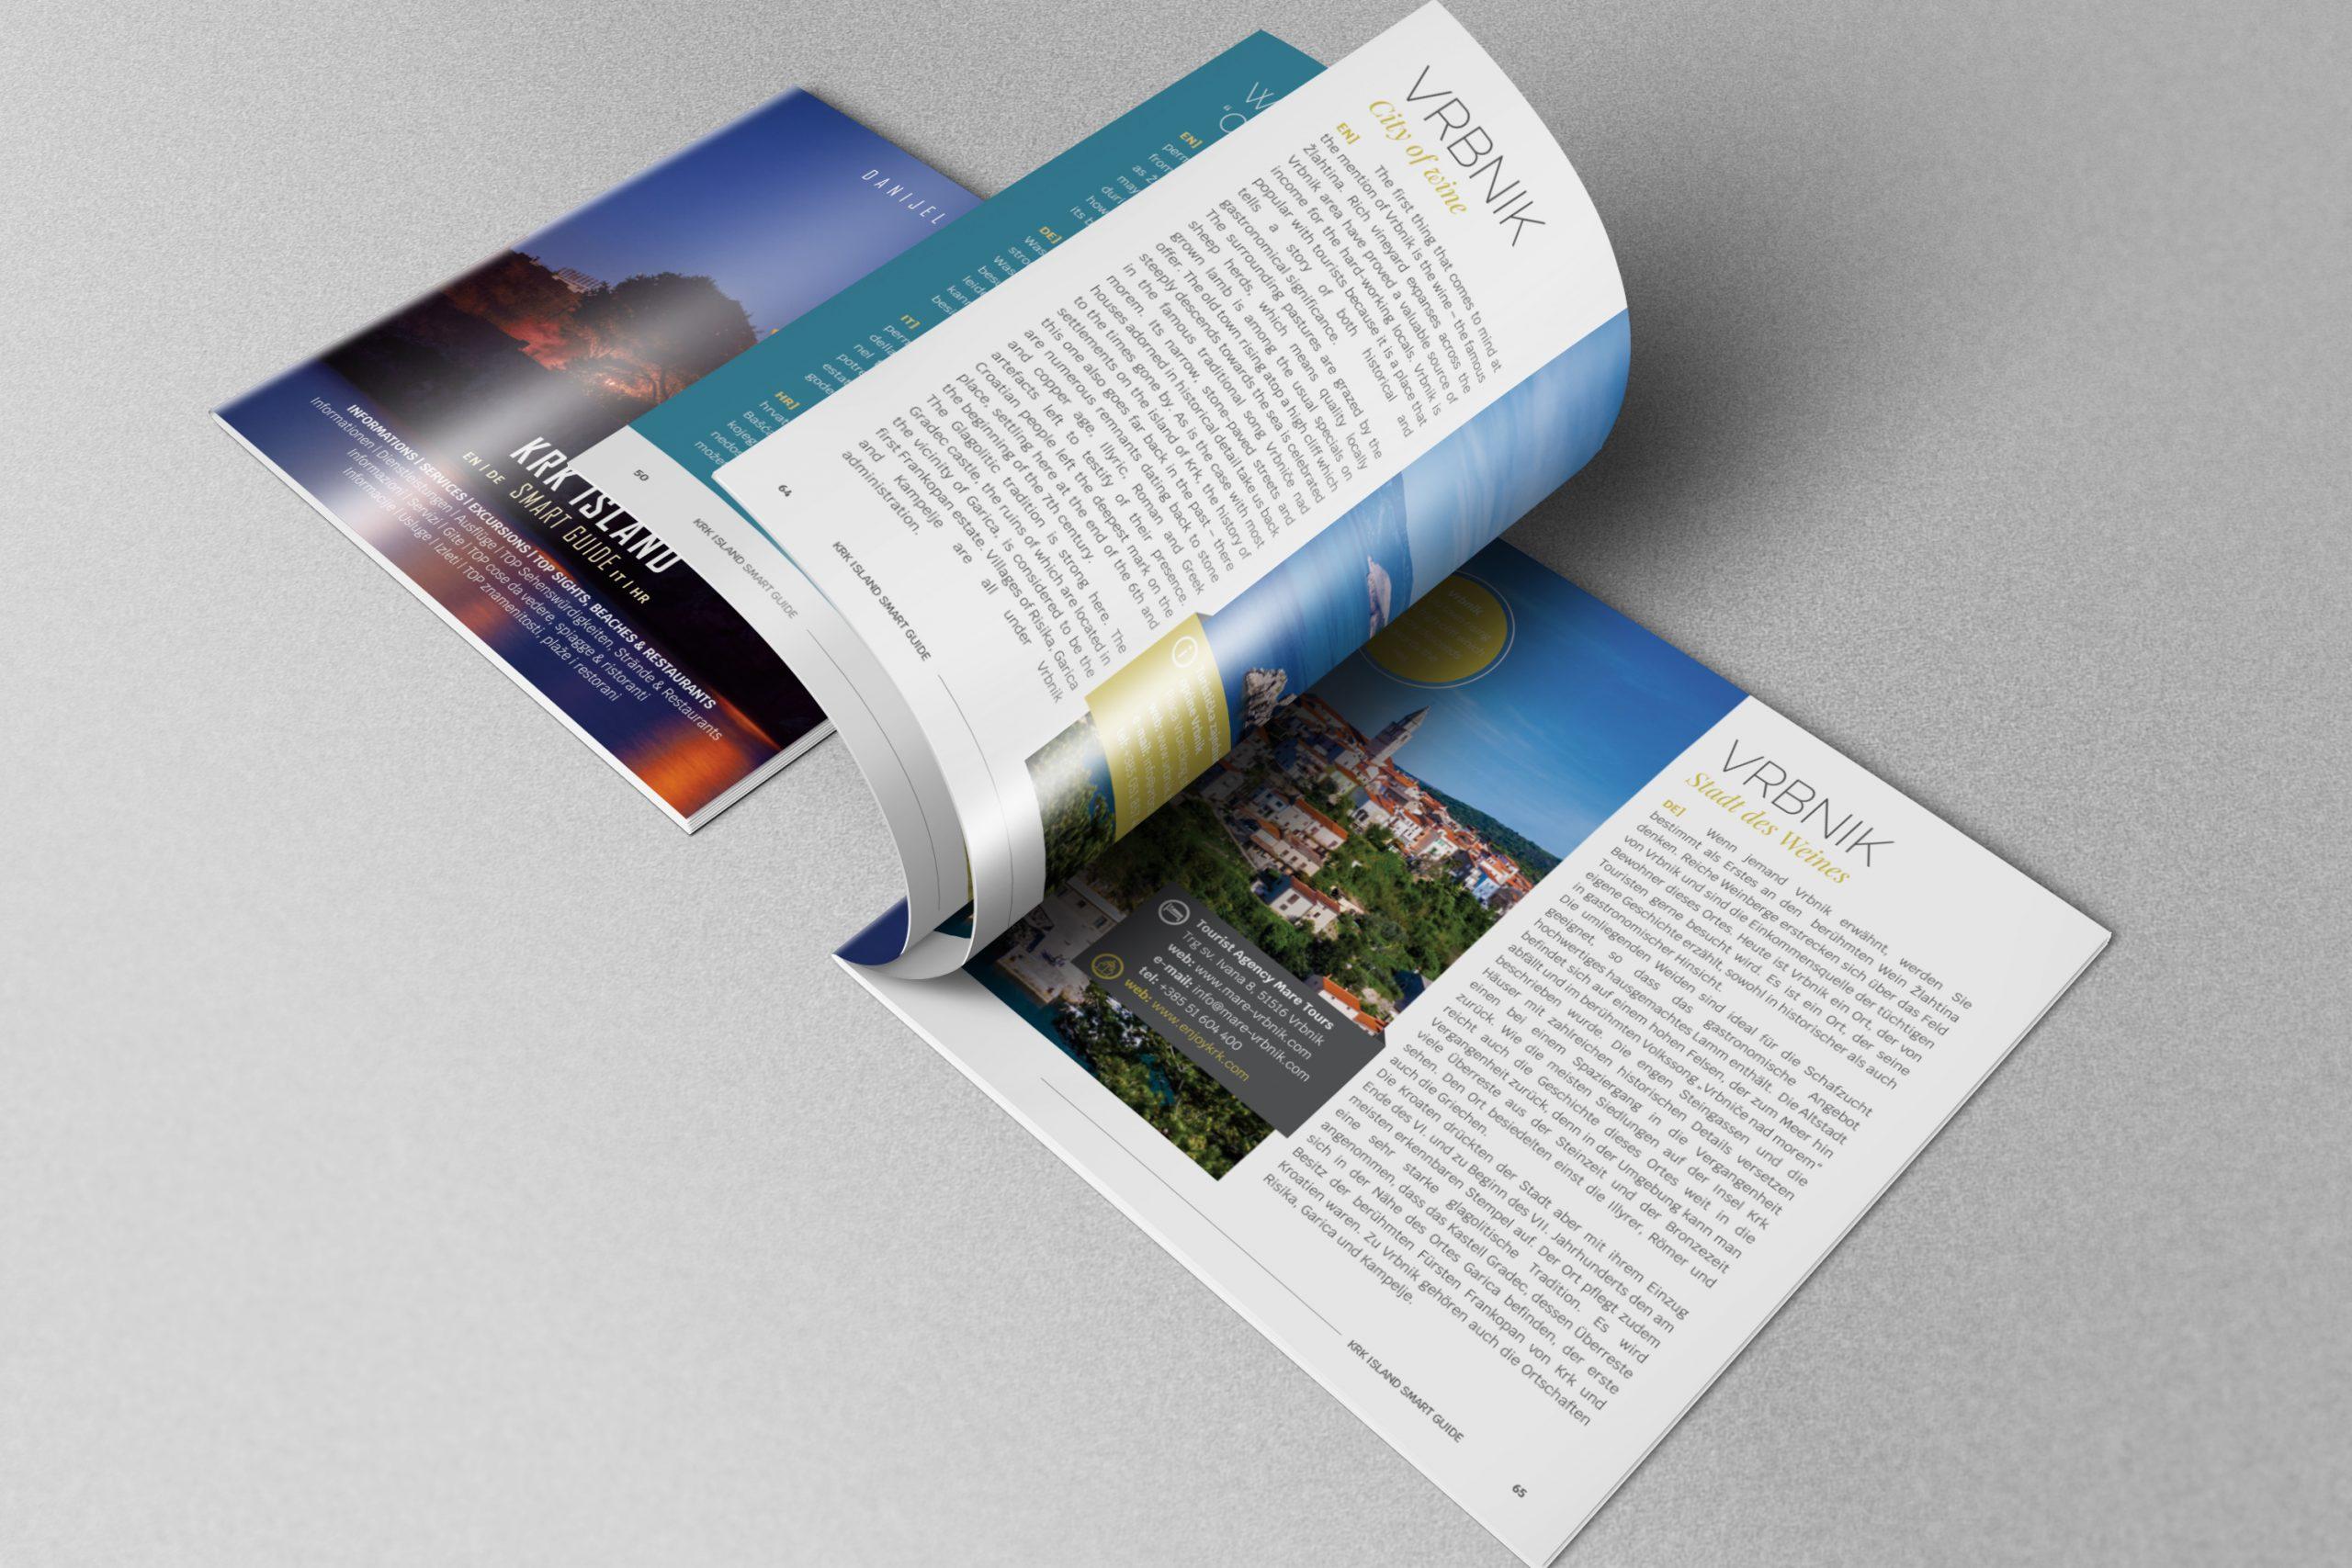 Krk Island Smart Guide